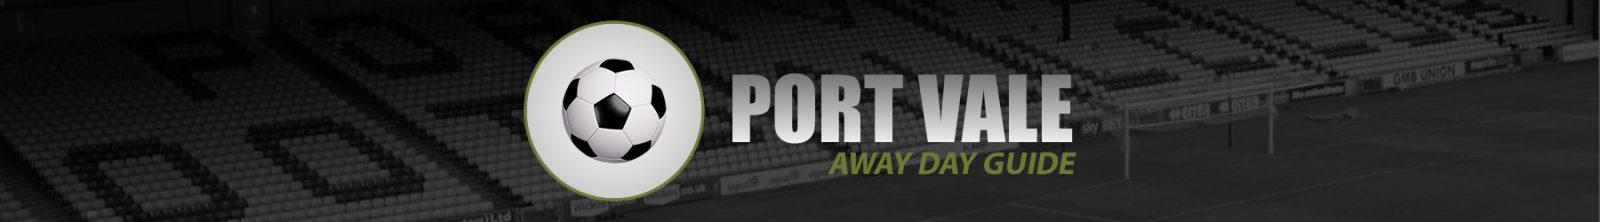 Port Vale Away